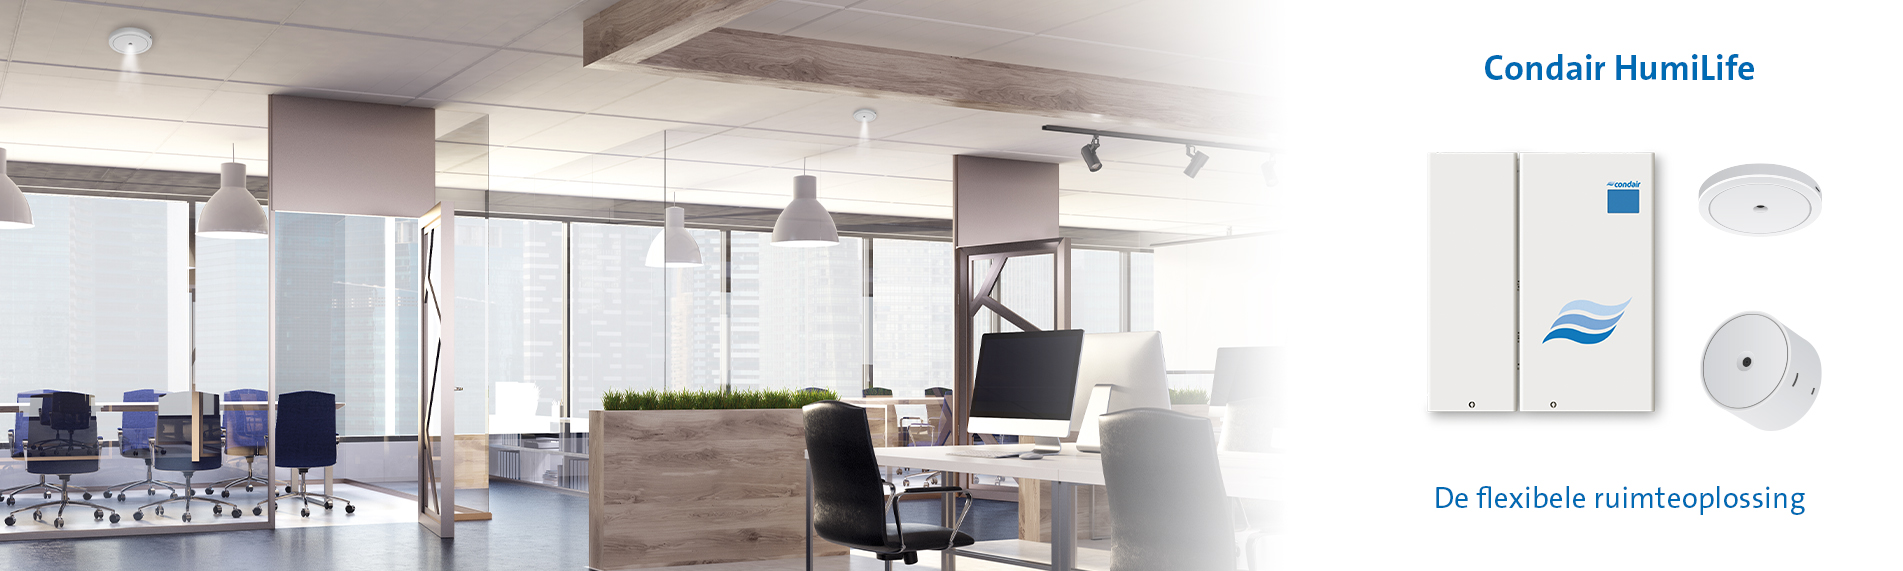 Condair HumiLife kantoor